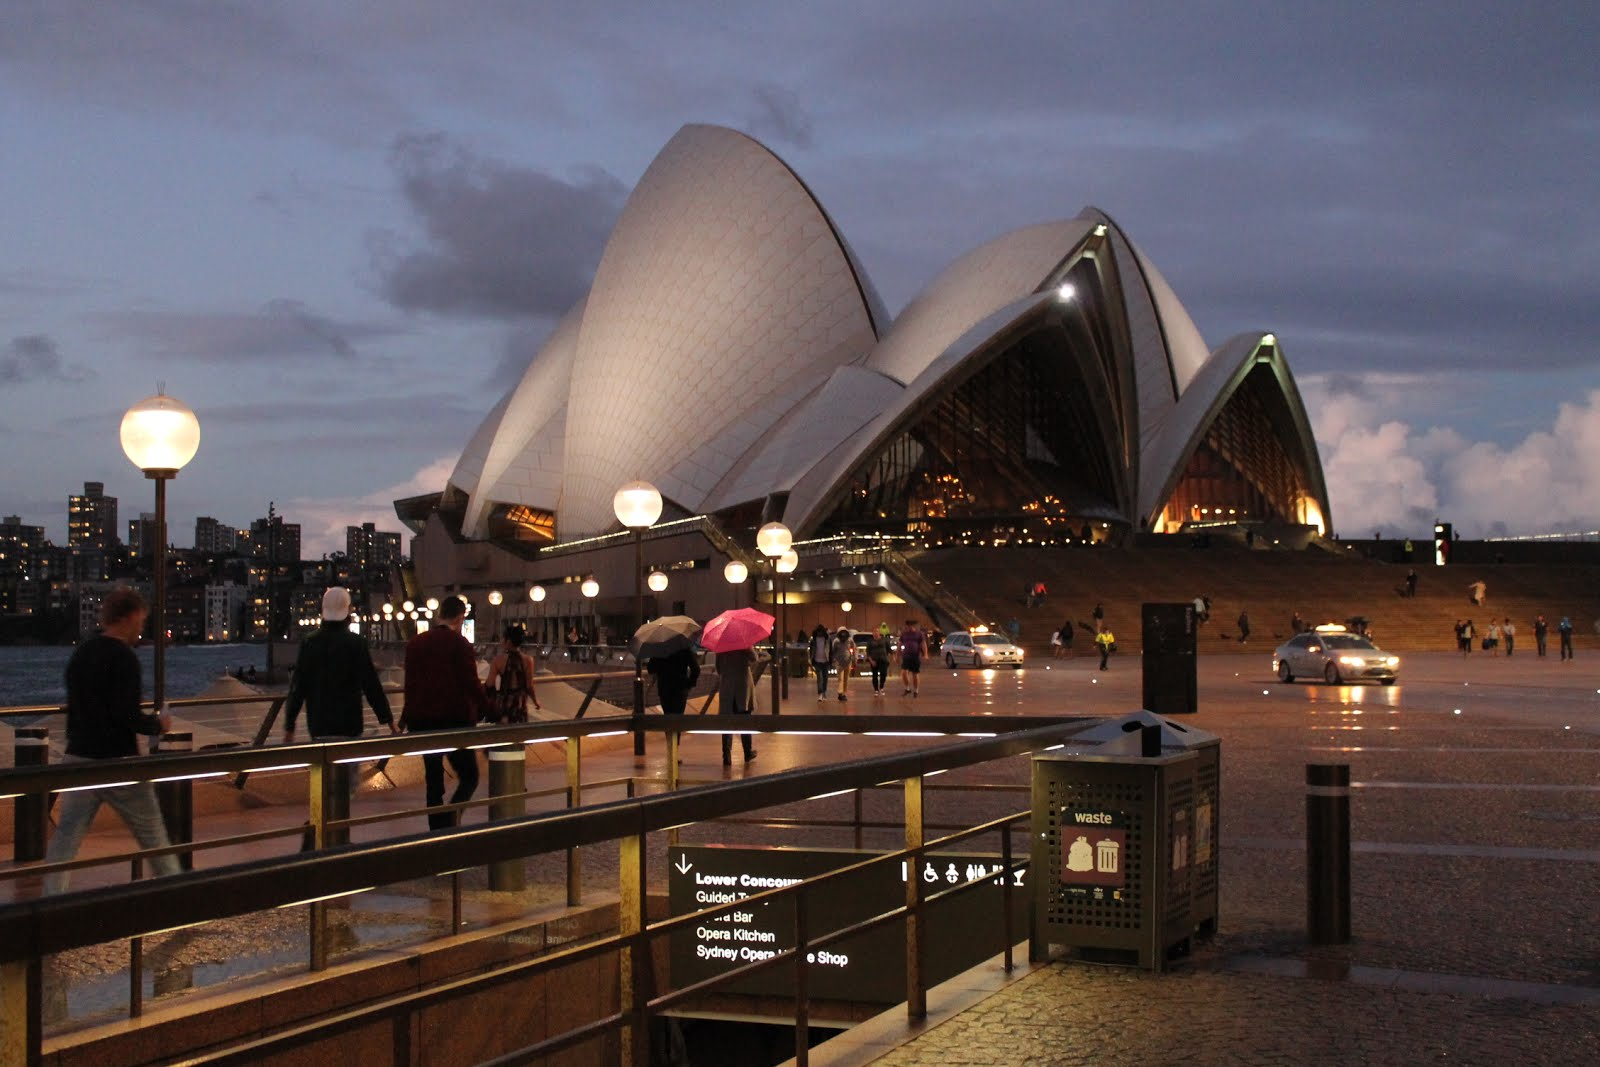 Sydney - Opera House by night